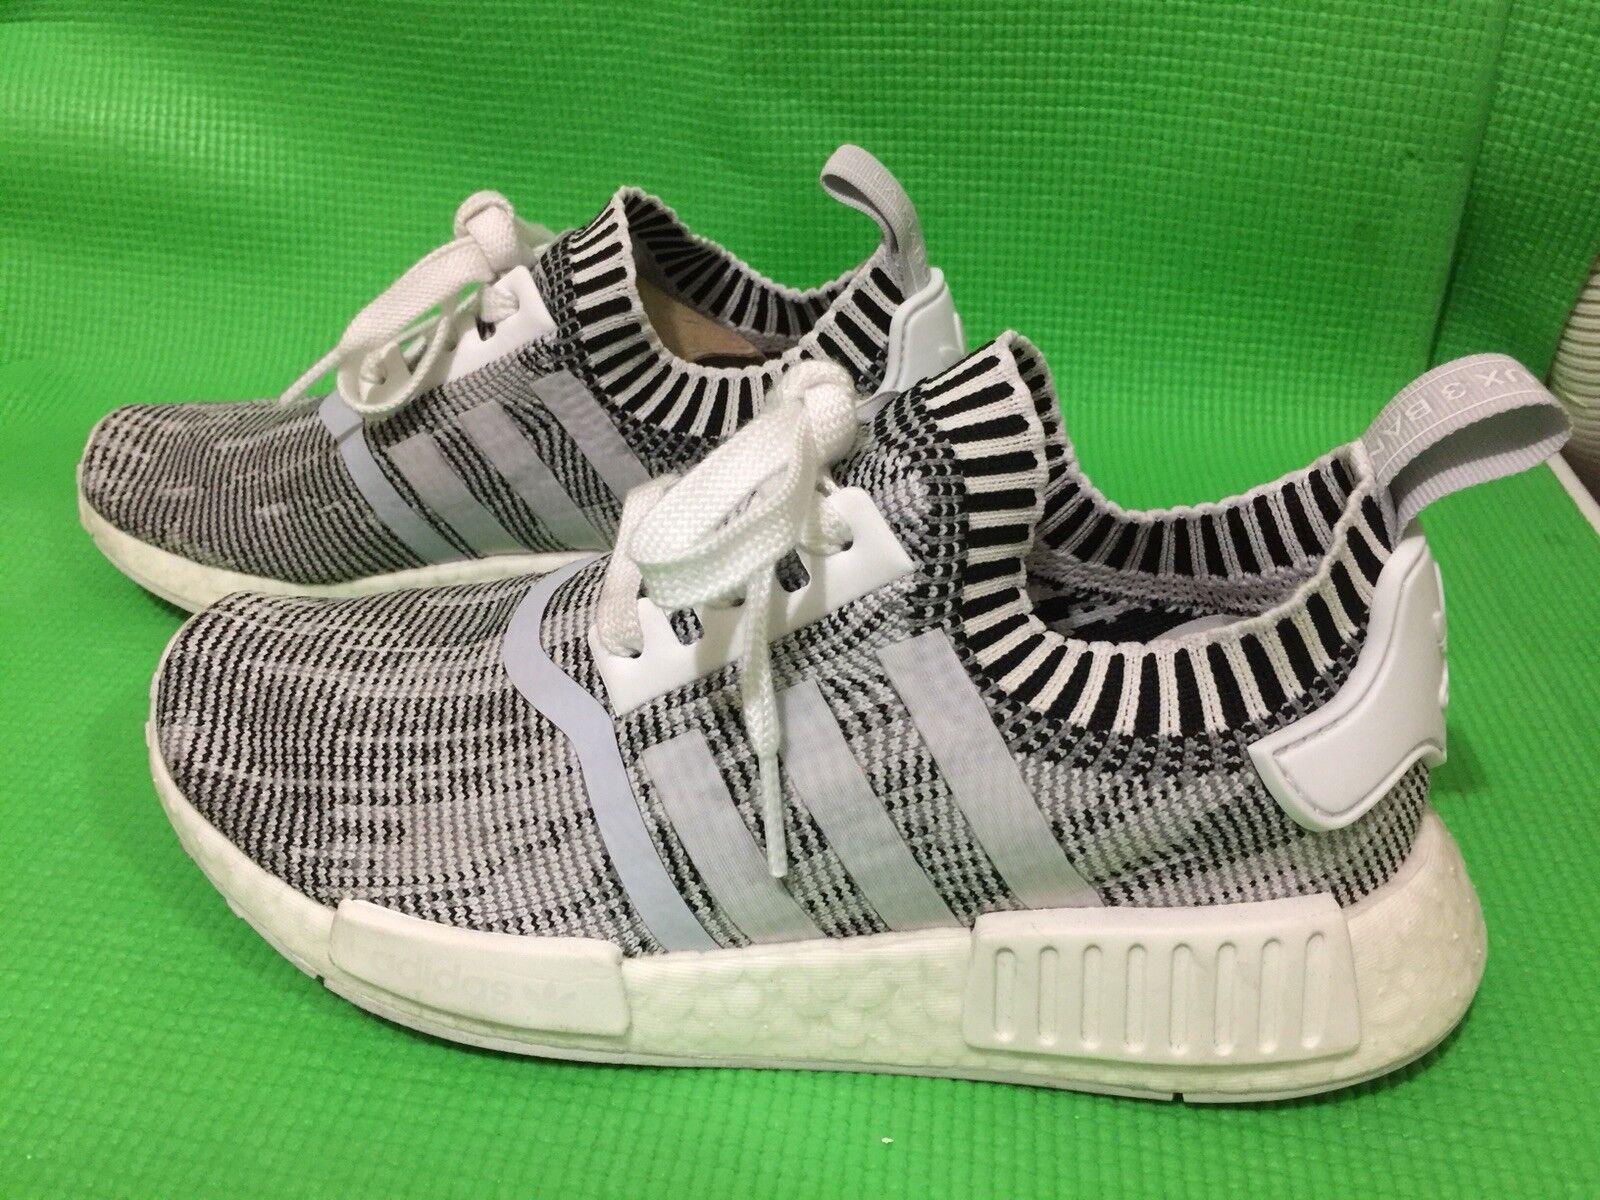 Nmd_r1 primeknit originali adidas mens grigio   grigio   nero 5y uomini usavano scarpe da corsa | Online Shop  | Uomo/Donna Scarpa